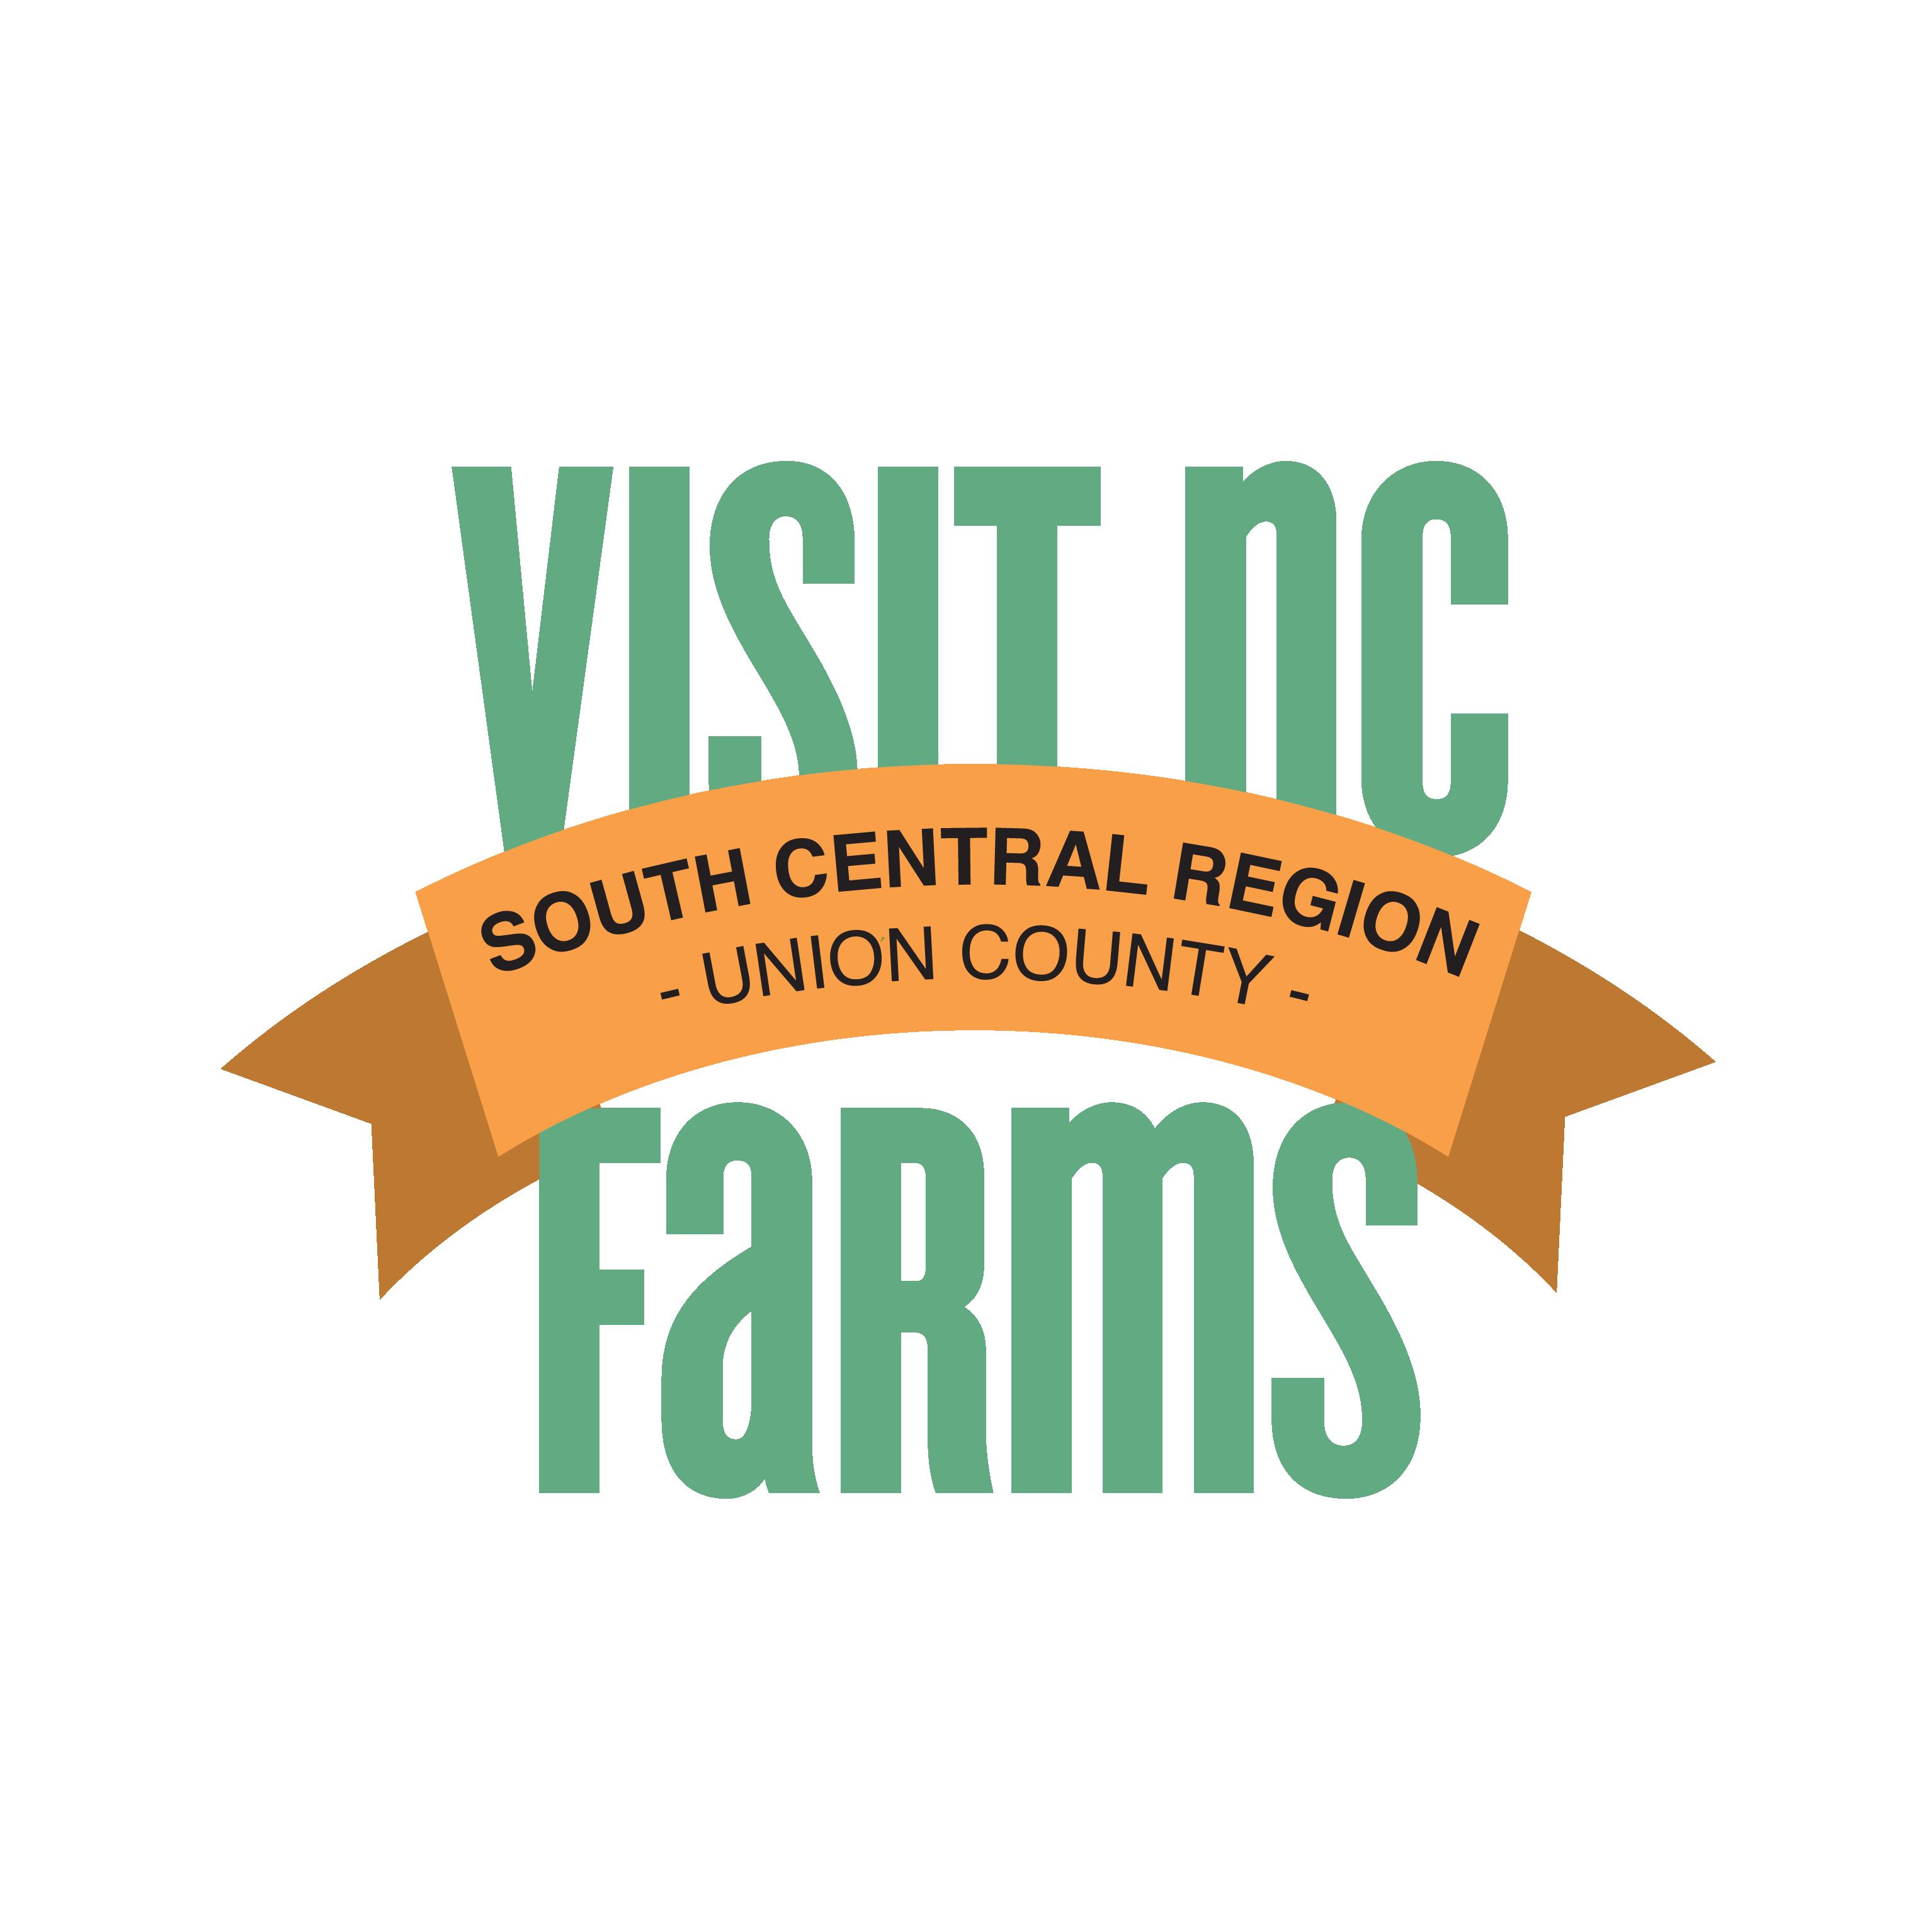 Visit North Carolina Farms Logo - Union County Local Foods